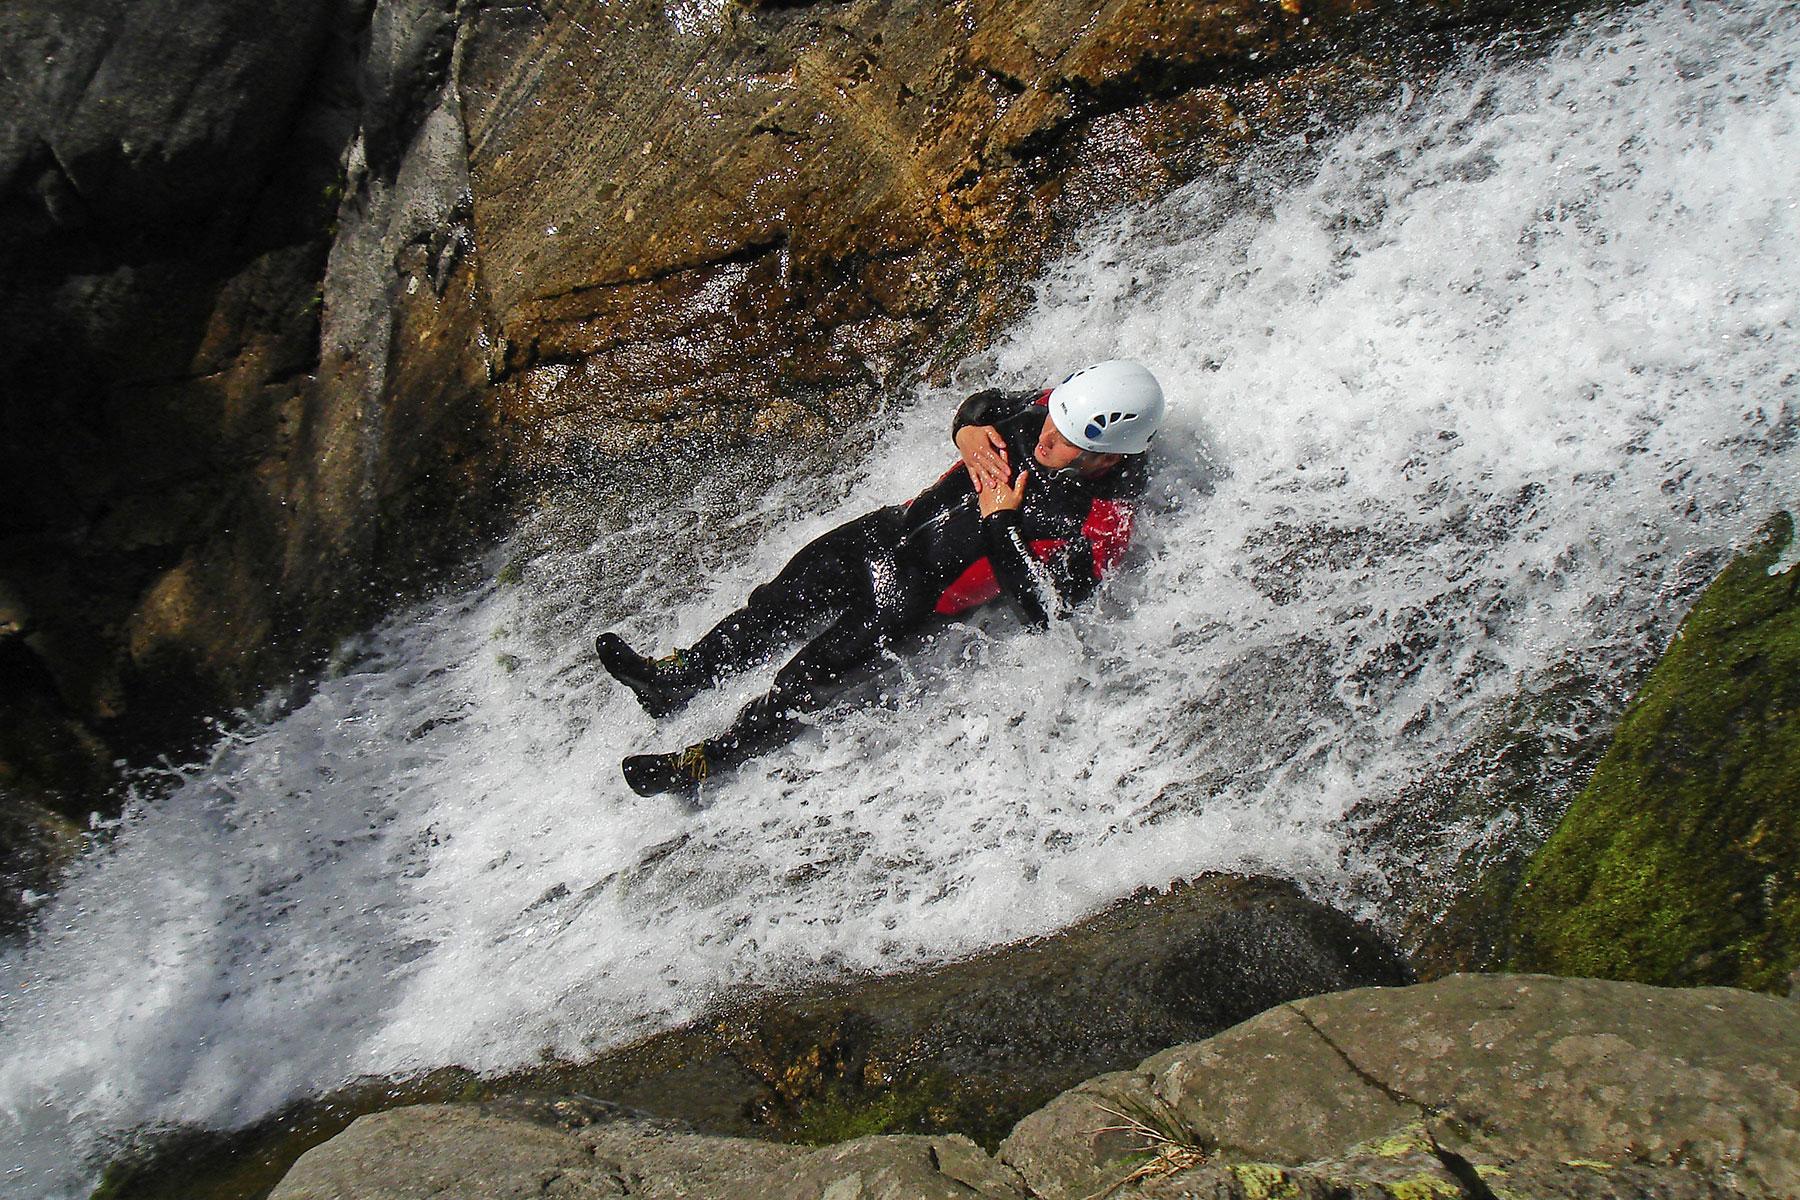 Canyoning ardeche, speleo ardeche, climbing and canyoning near Aubenas